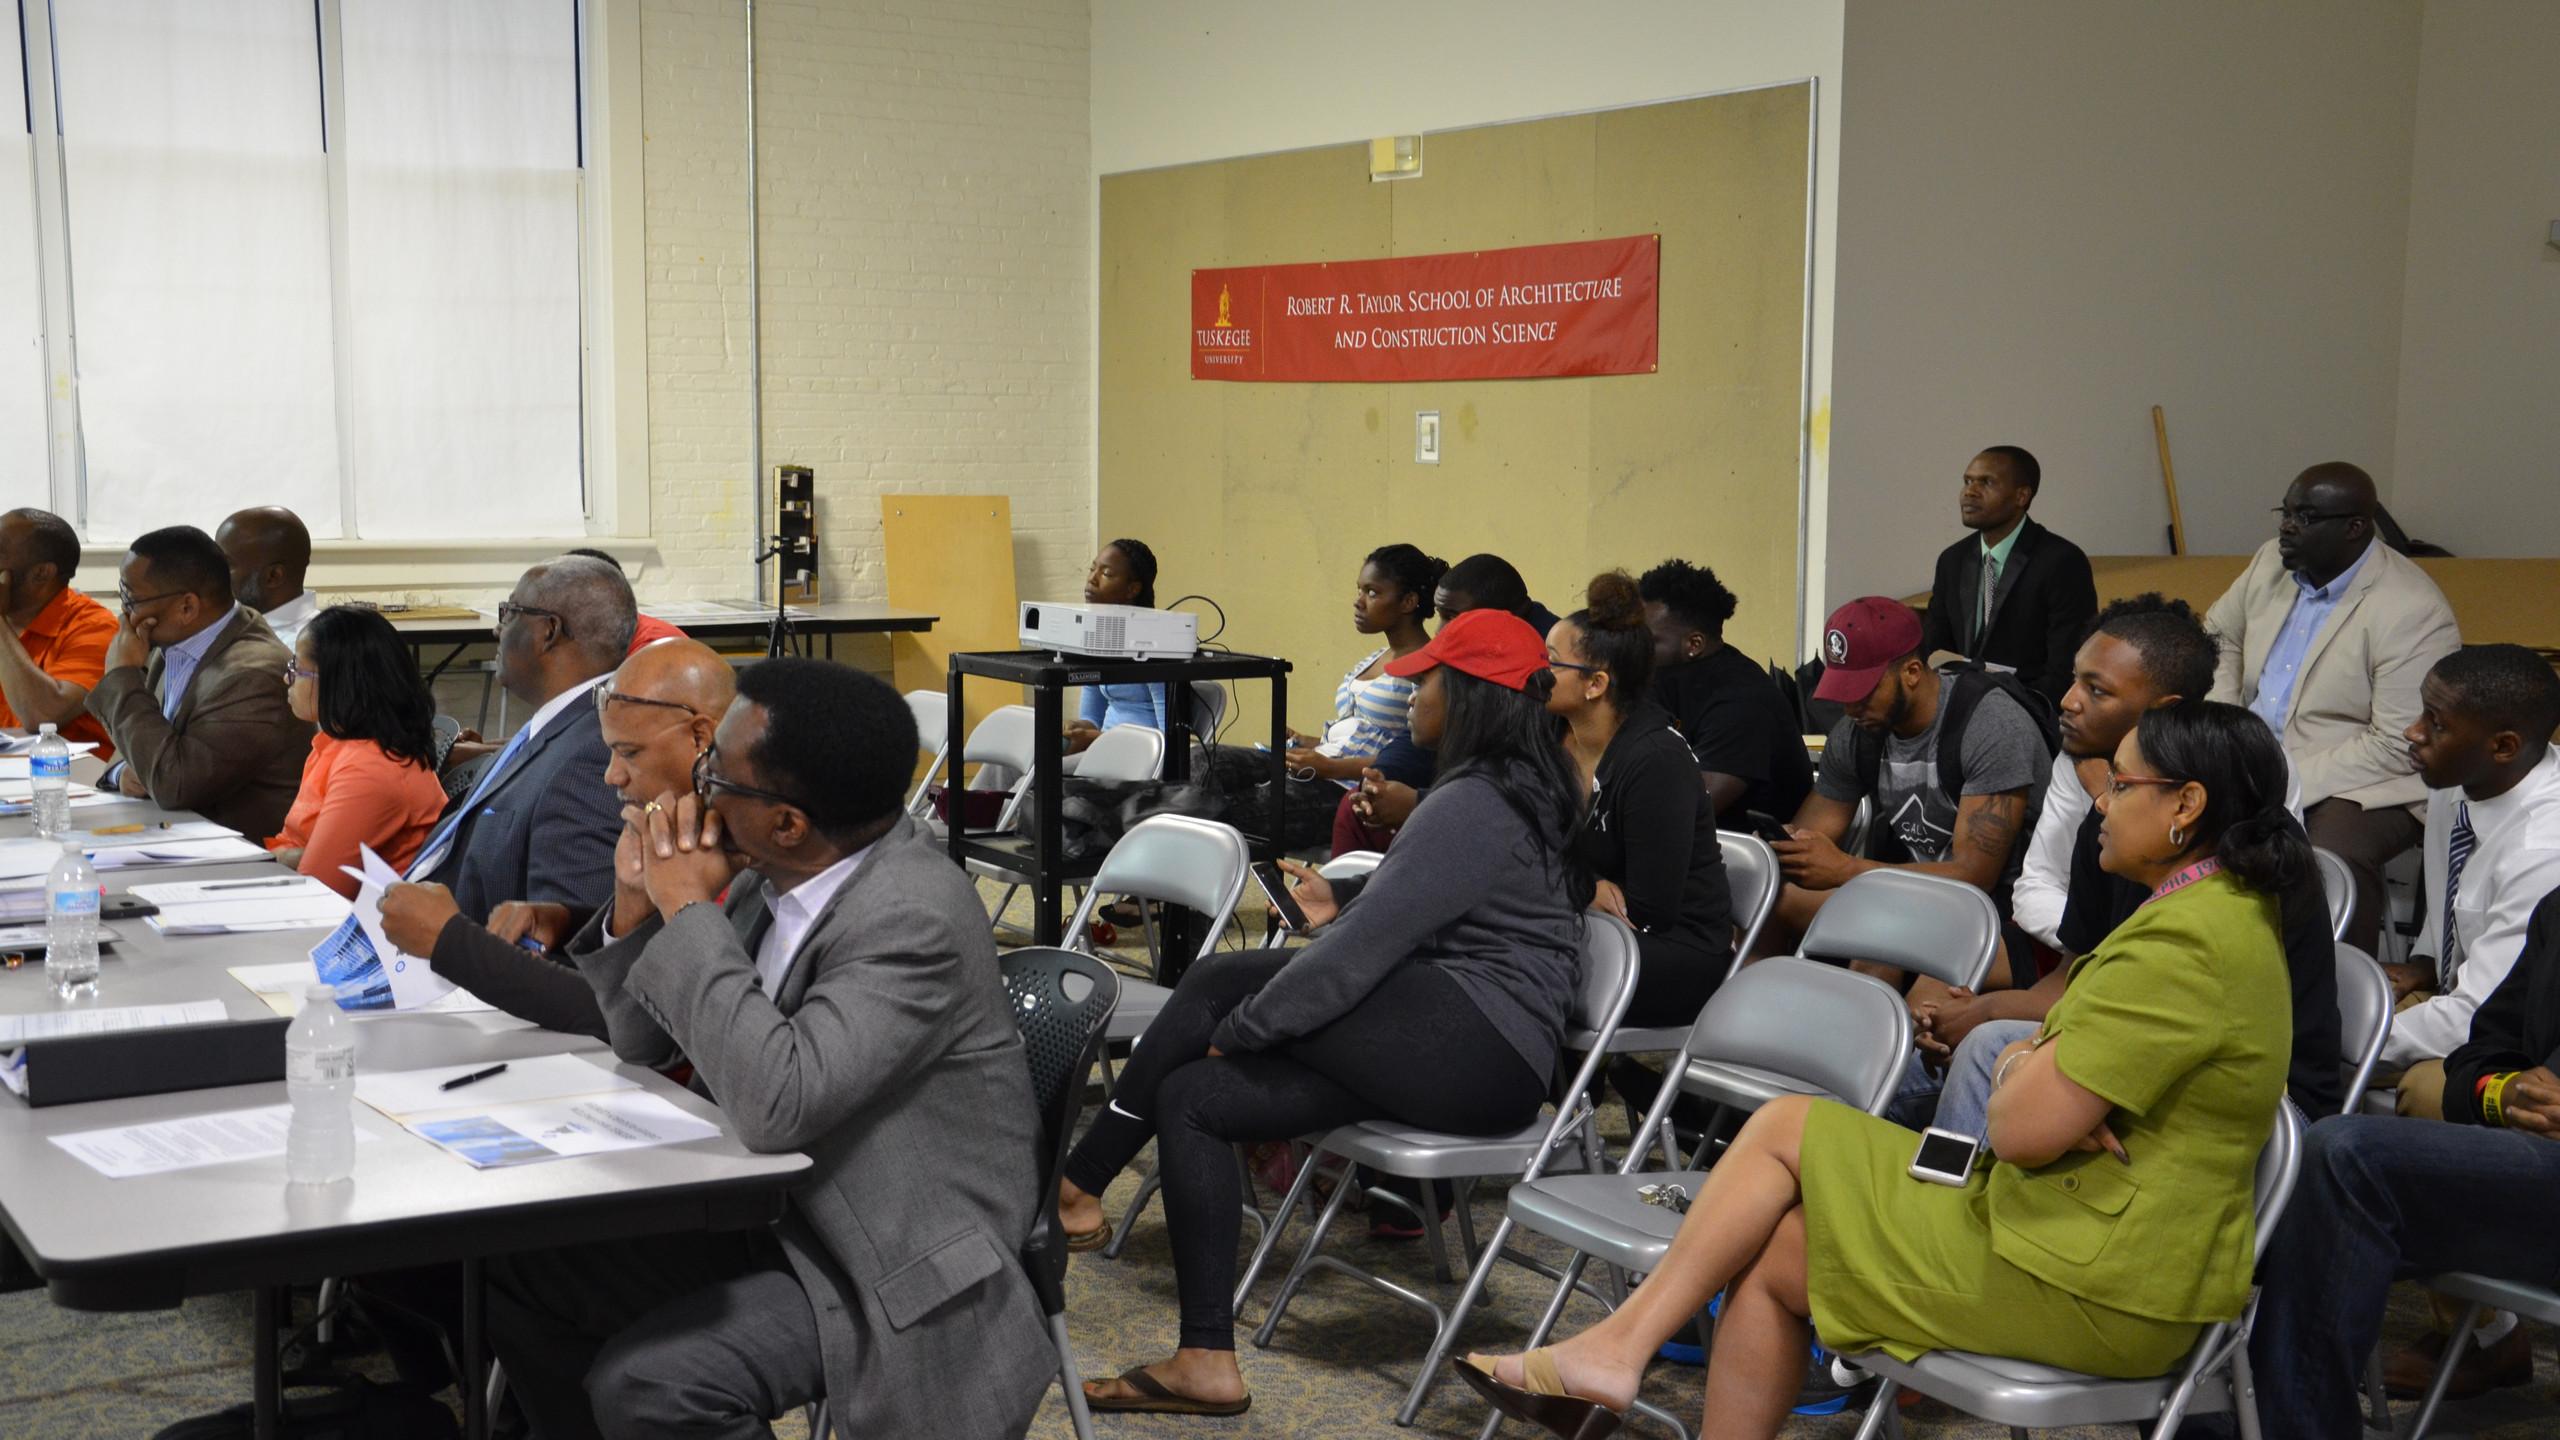 2016 Capstone Presentations Attendees